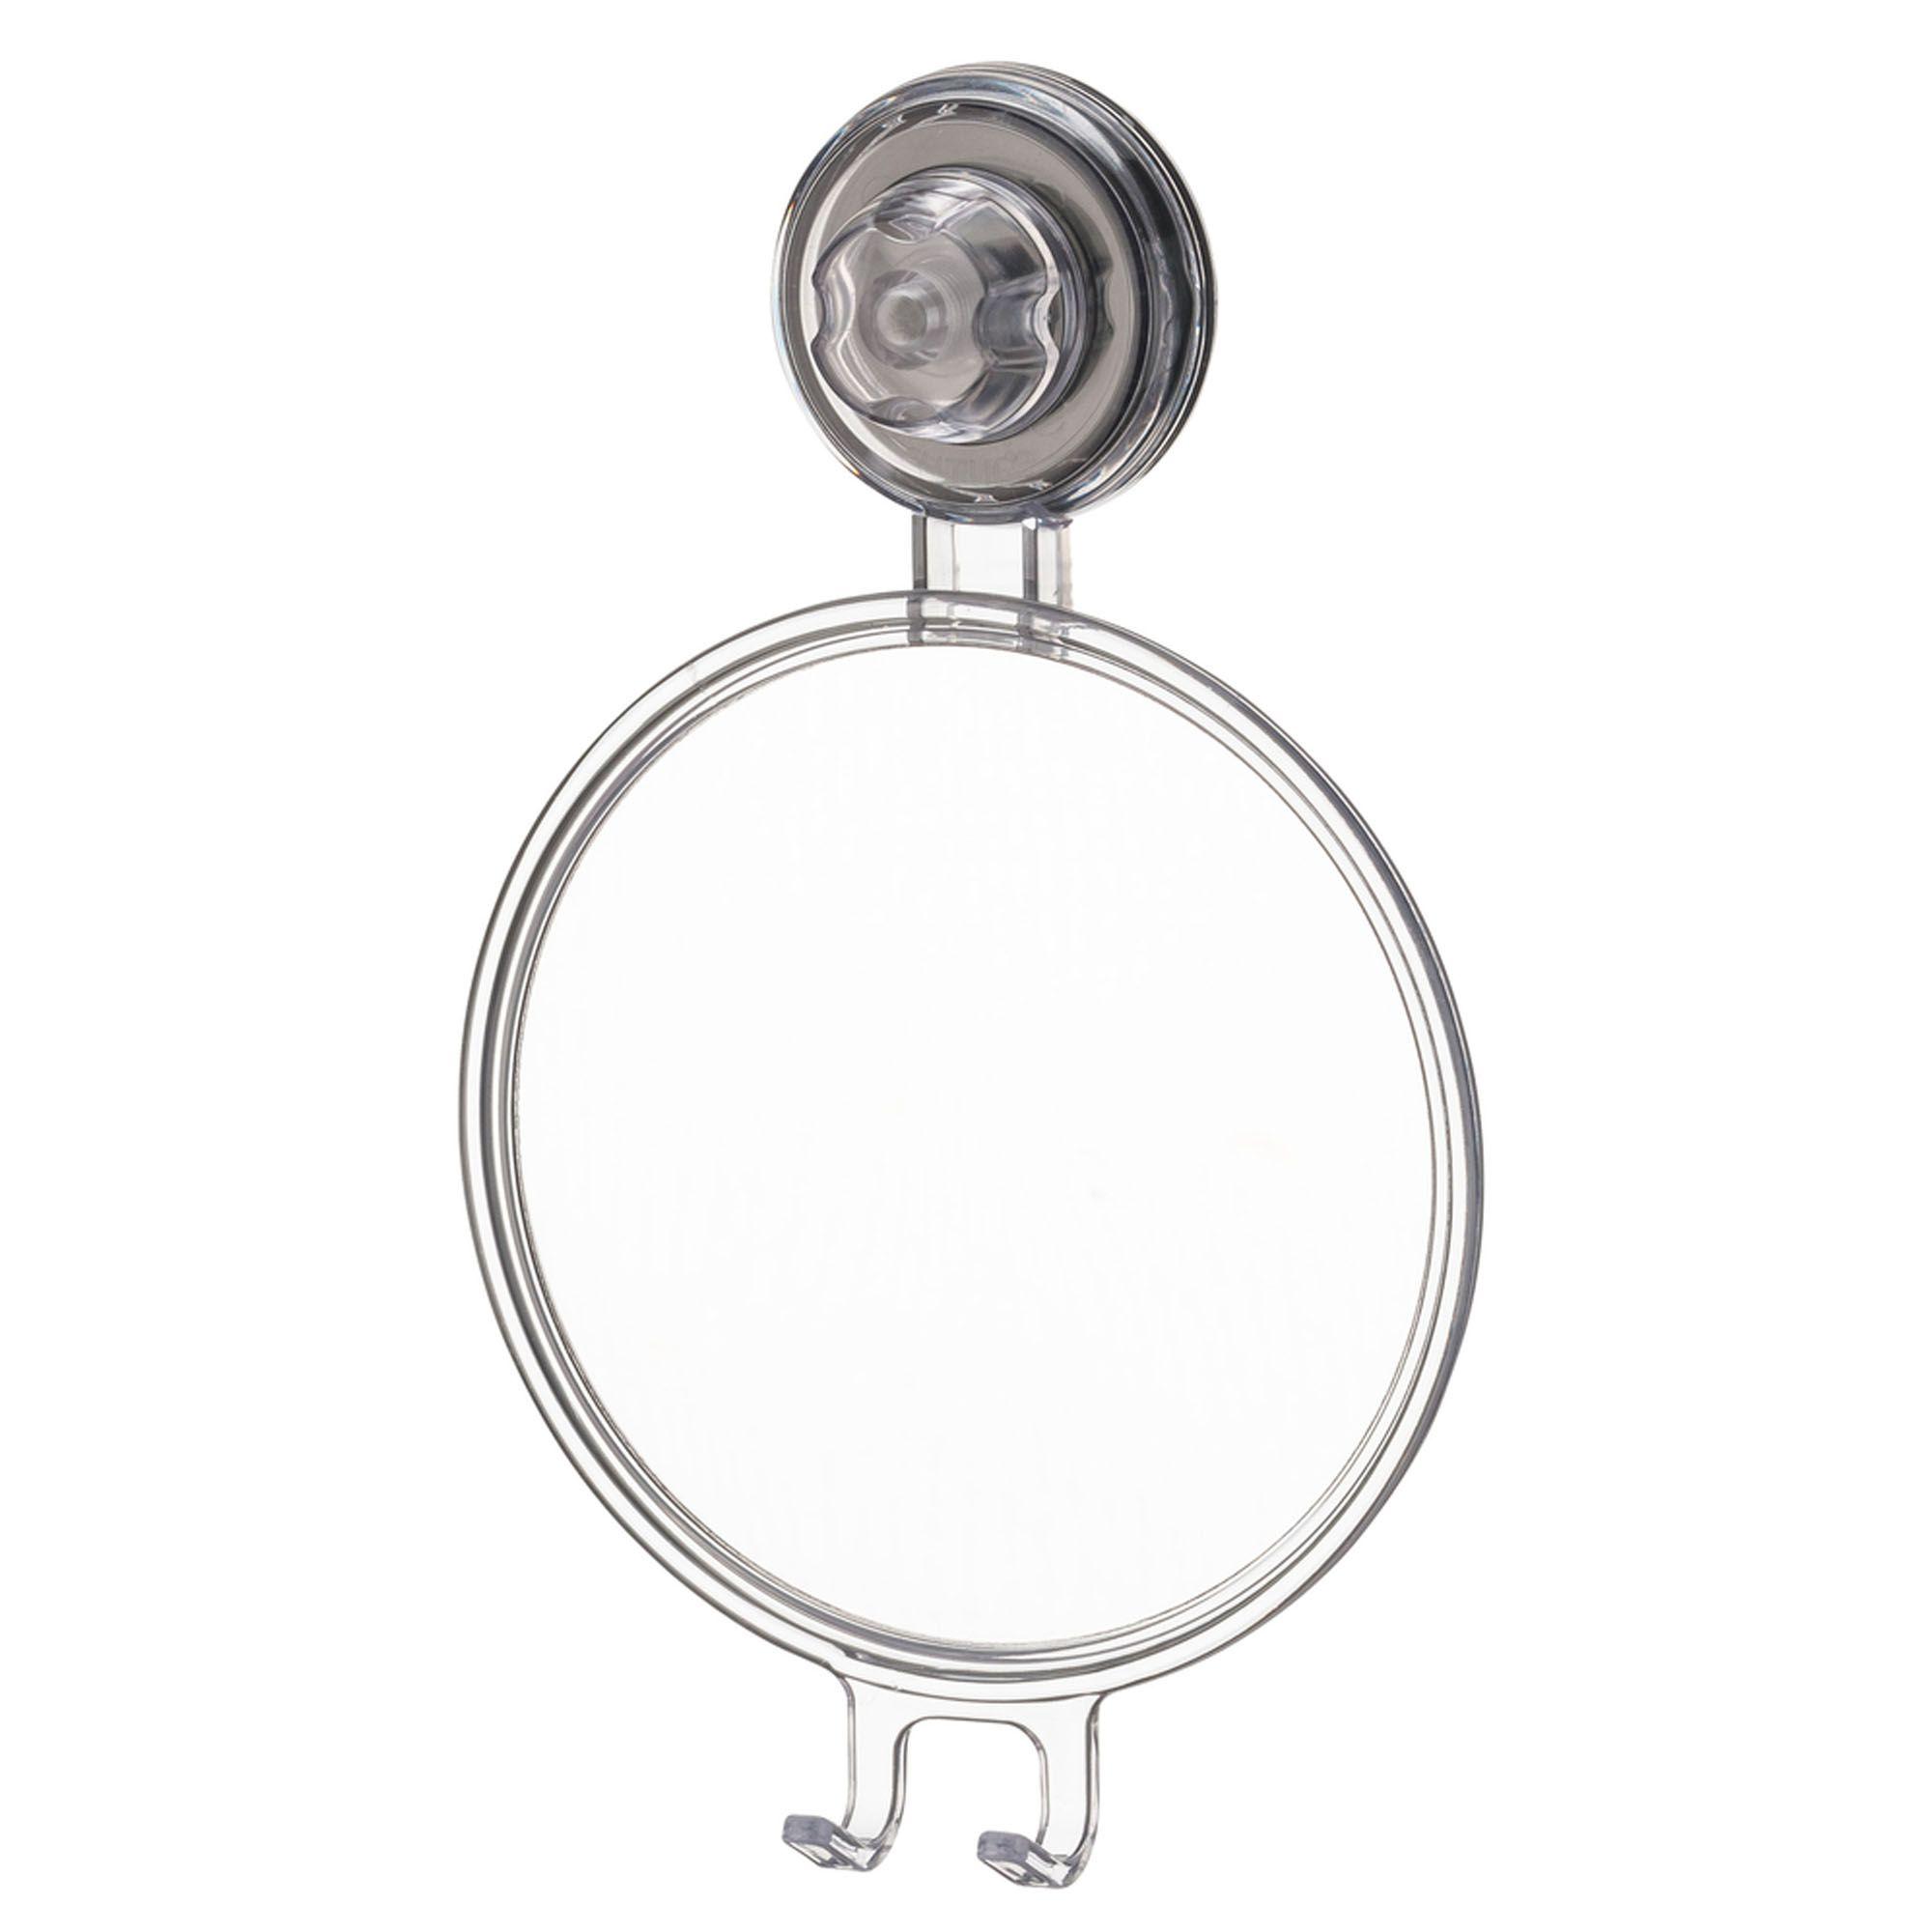 Espelho Antiembaçante c/ Ventosa 406 - FUTURE